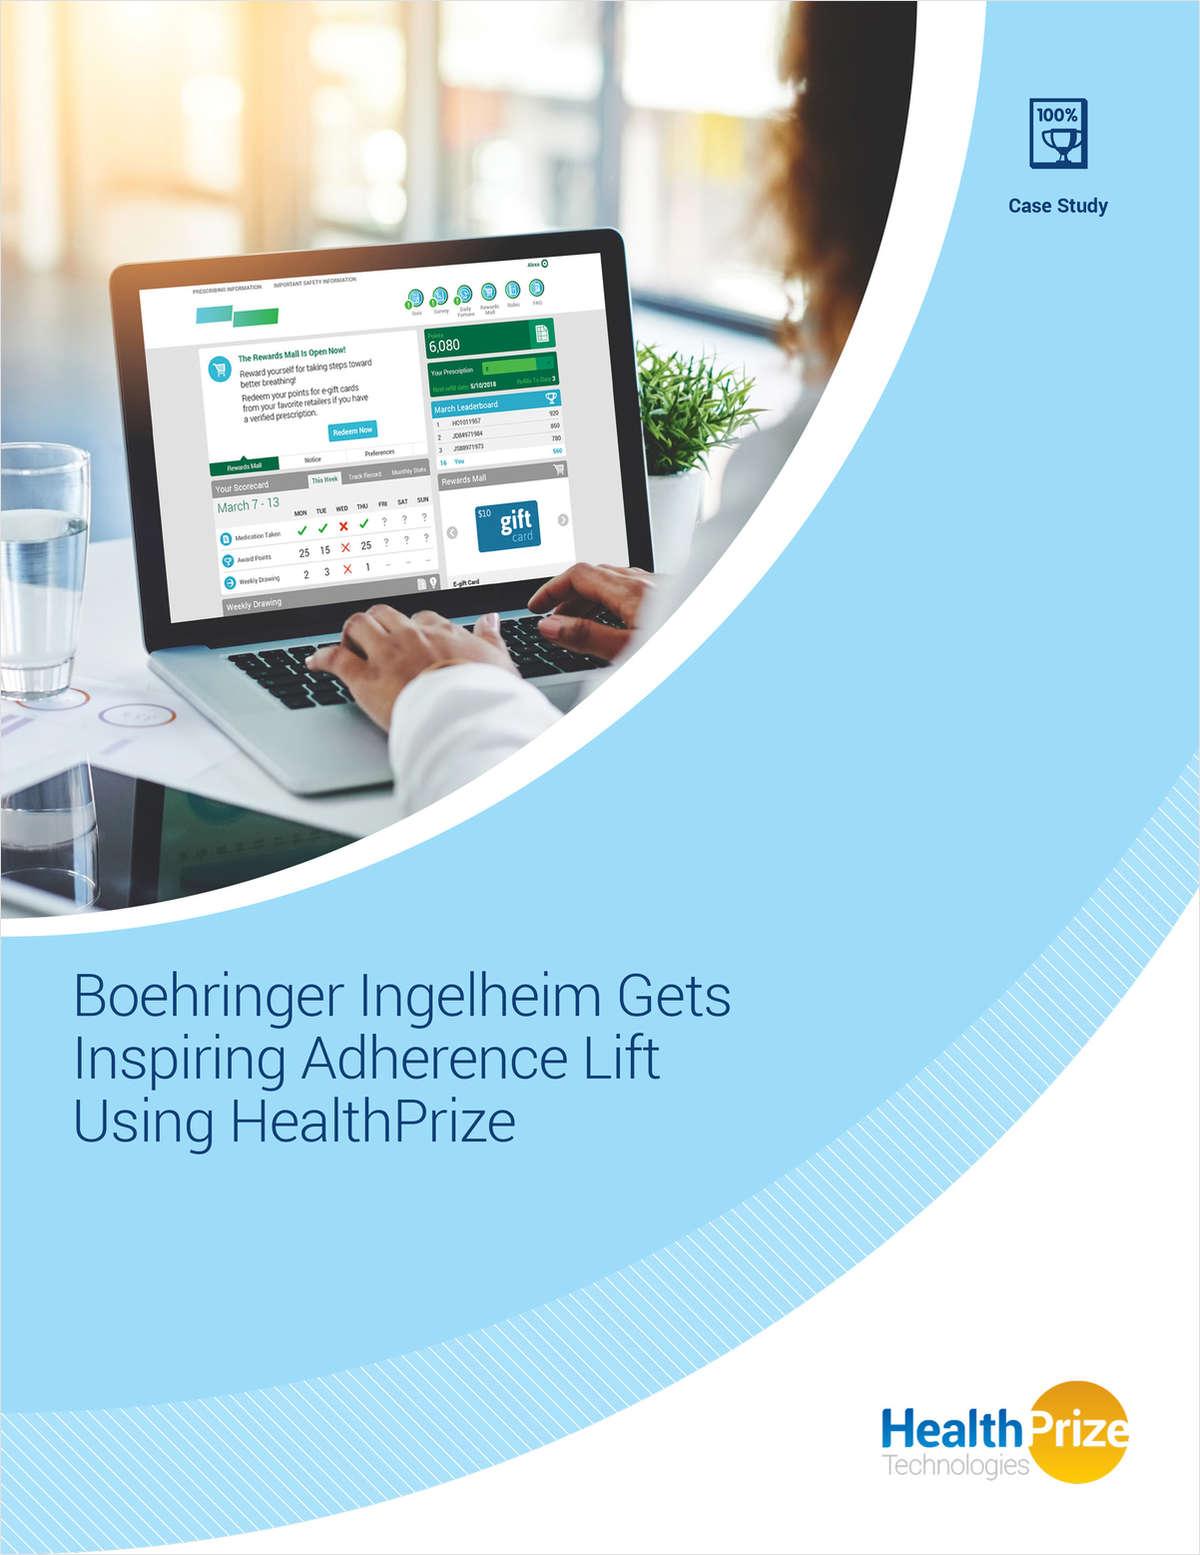 How Boehringer Ingelheim Improved Adherence Using HealthPrize